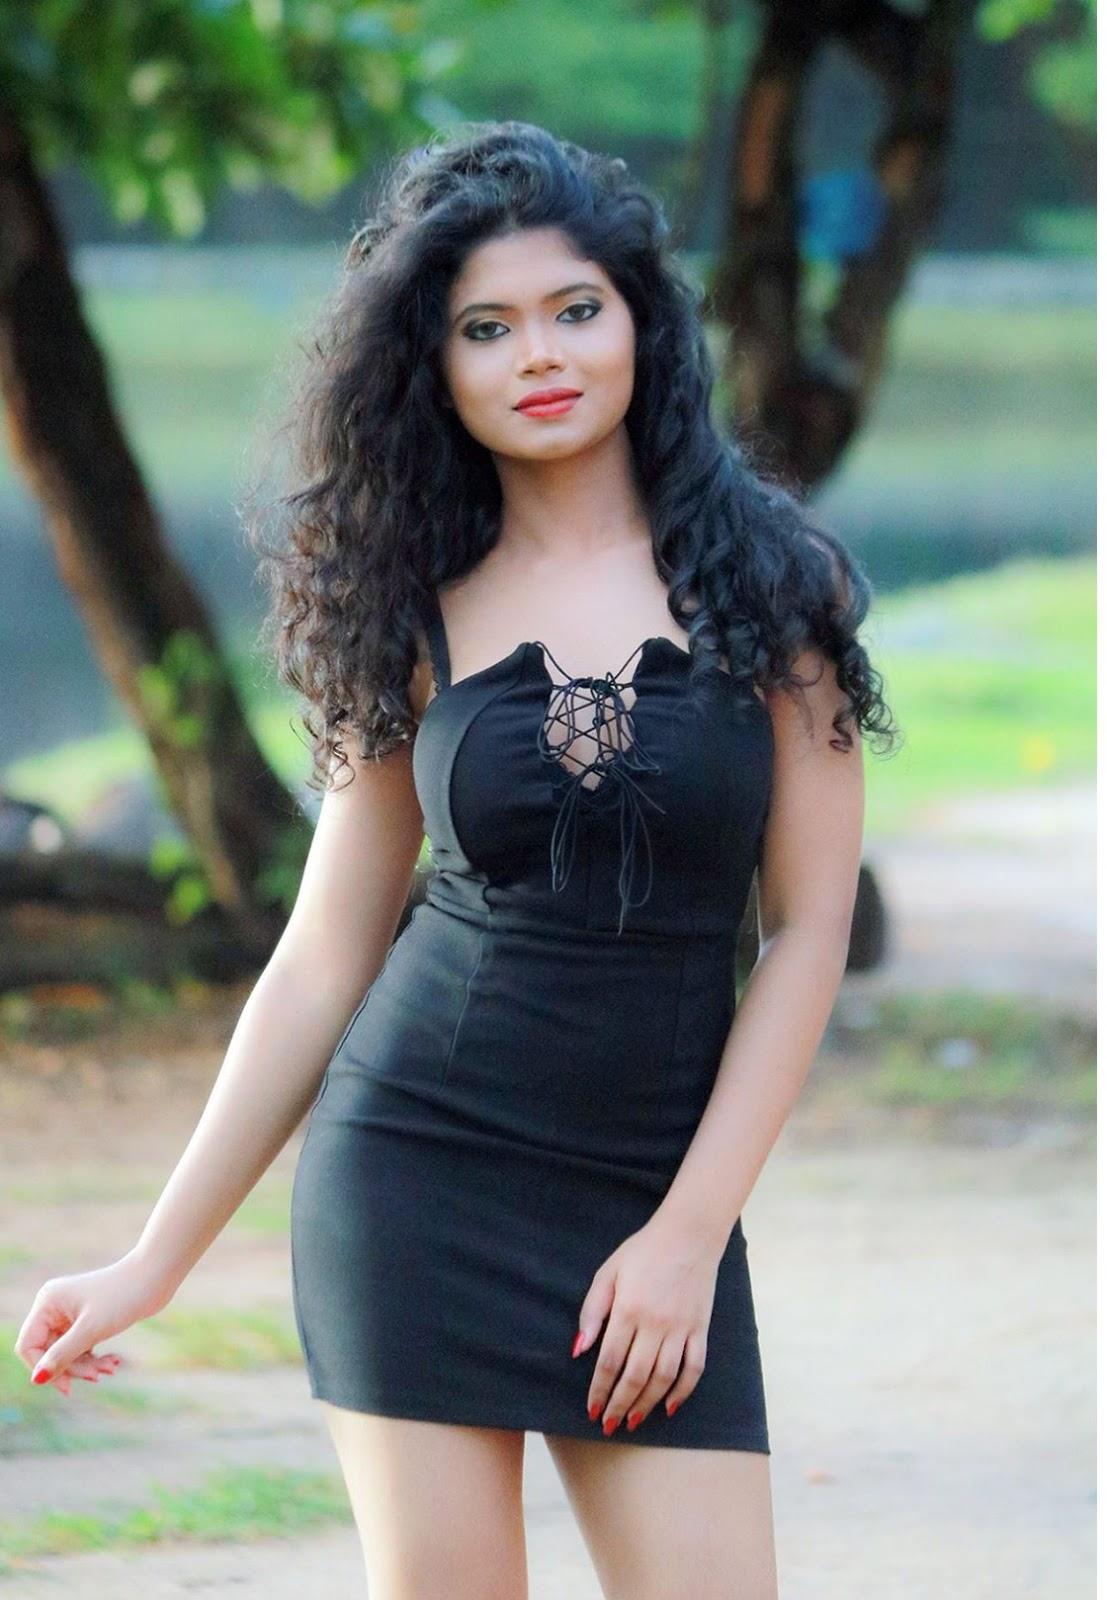 Beauty Girl in Sri Lanka Hasini Samuel Model | CeylonFace